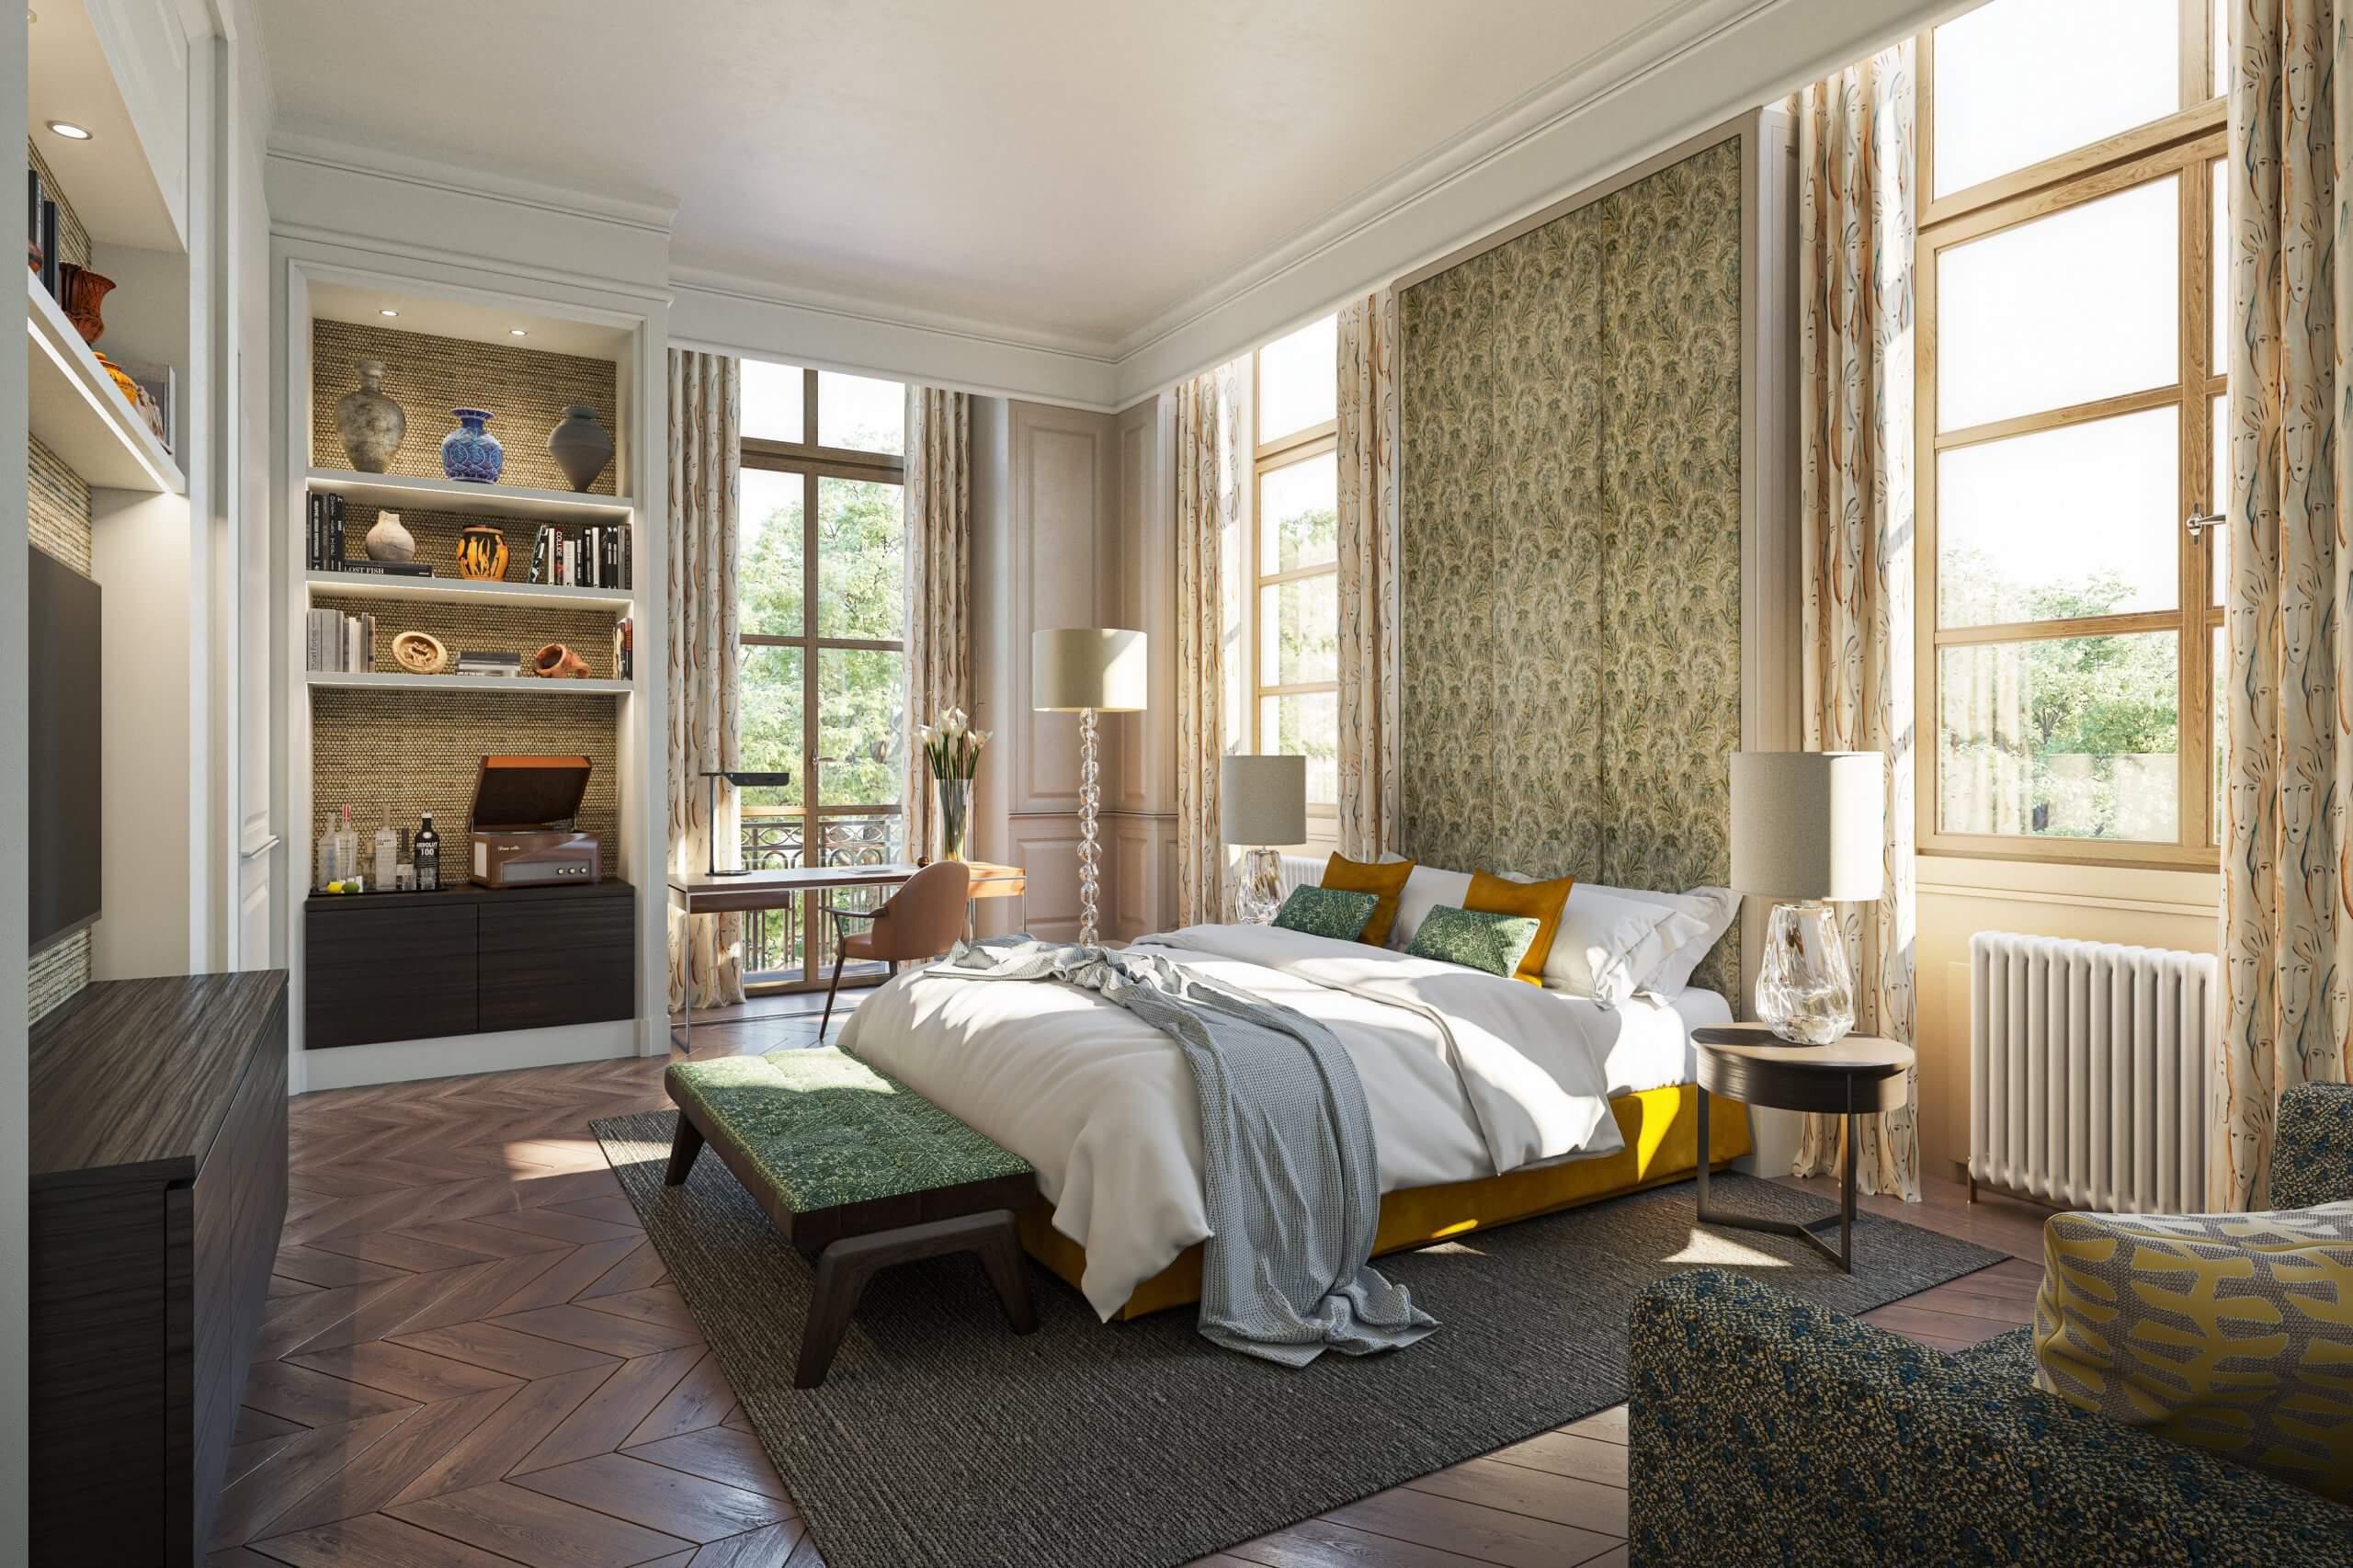 Hotel-Metropole_Room-123_R02